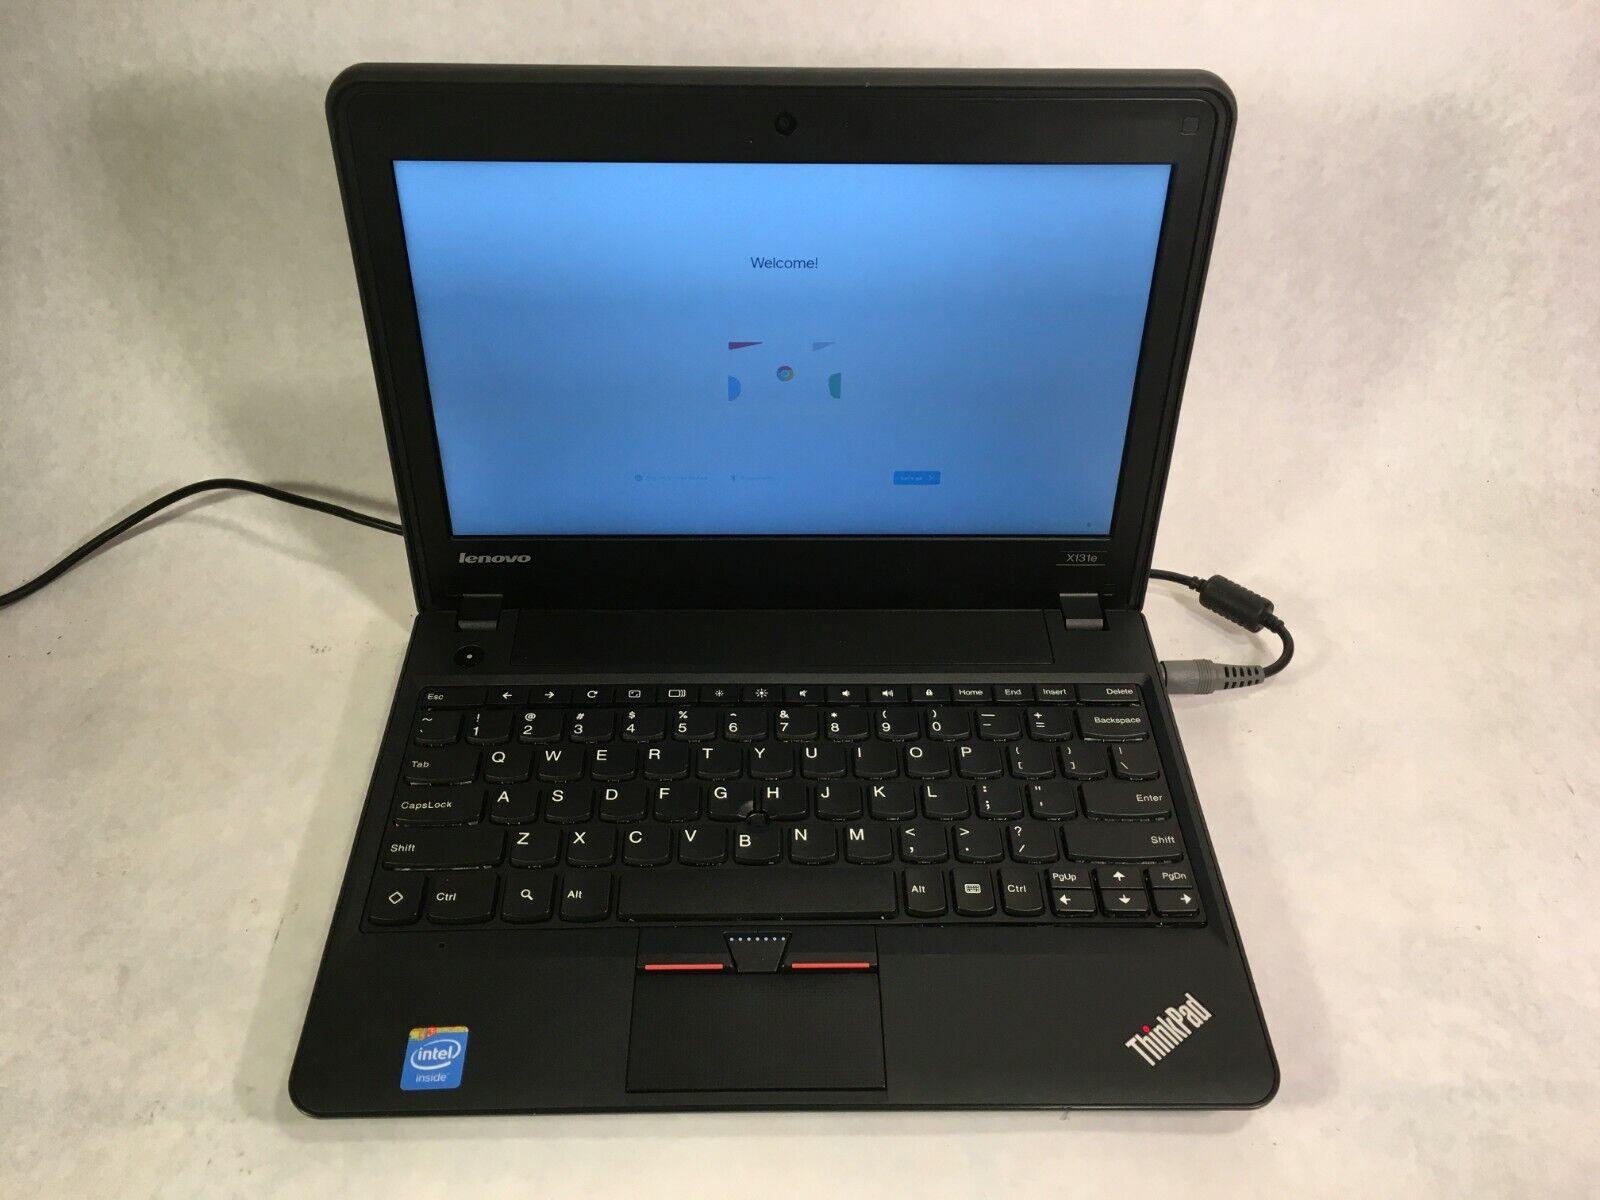 "Lenovo ThinkPad x131e Chromebook 11.6"" Intel Celeron 1.5GHz"